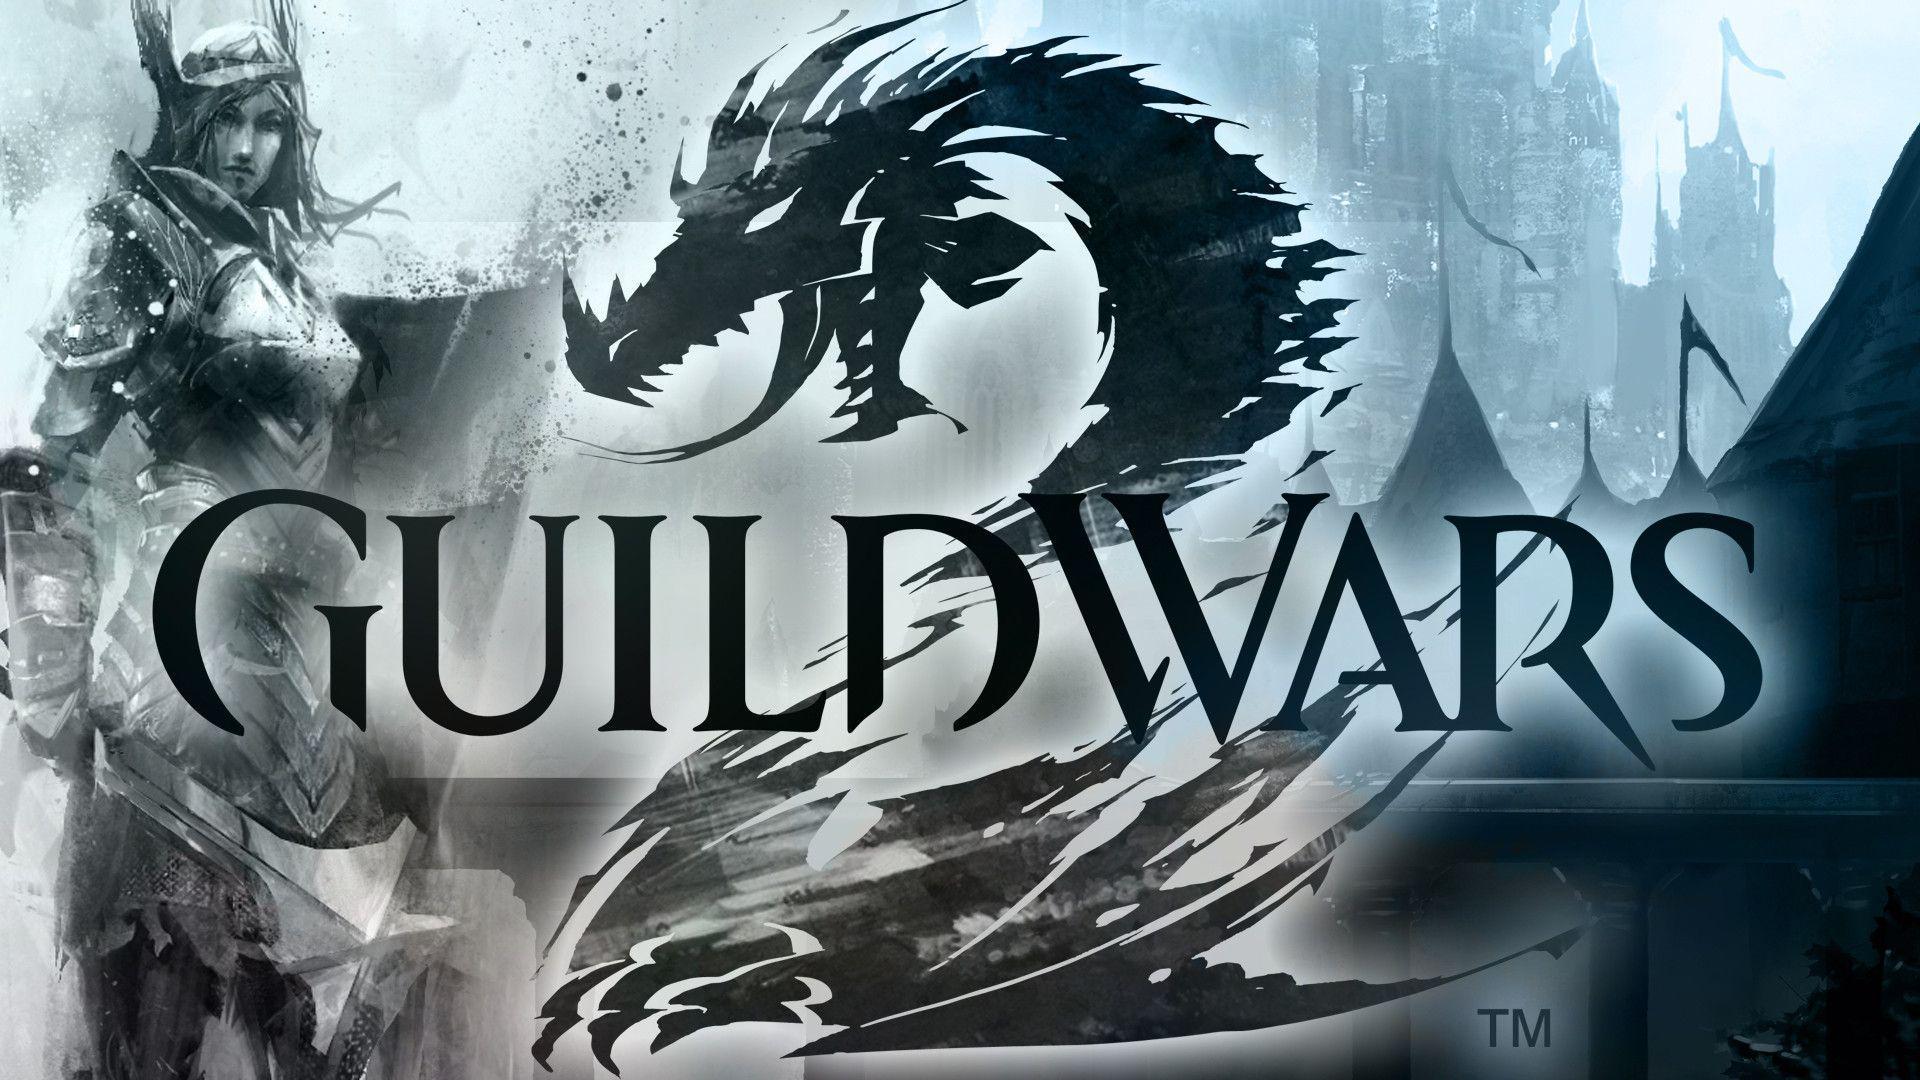 guild wars 2 guardian wallpapers wallpaper cave